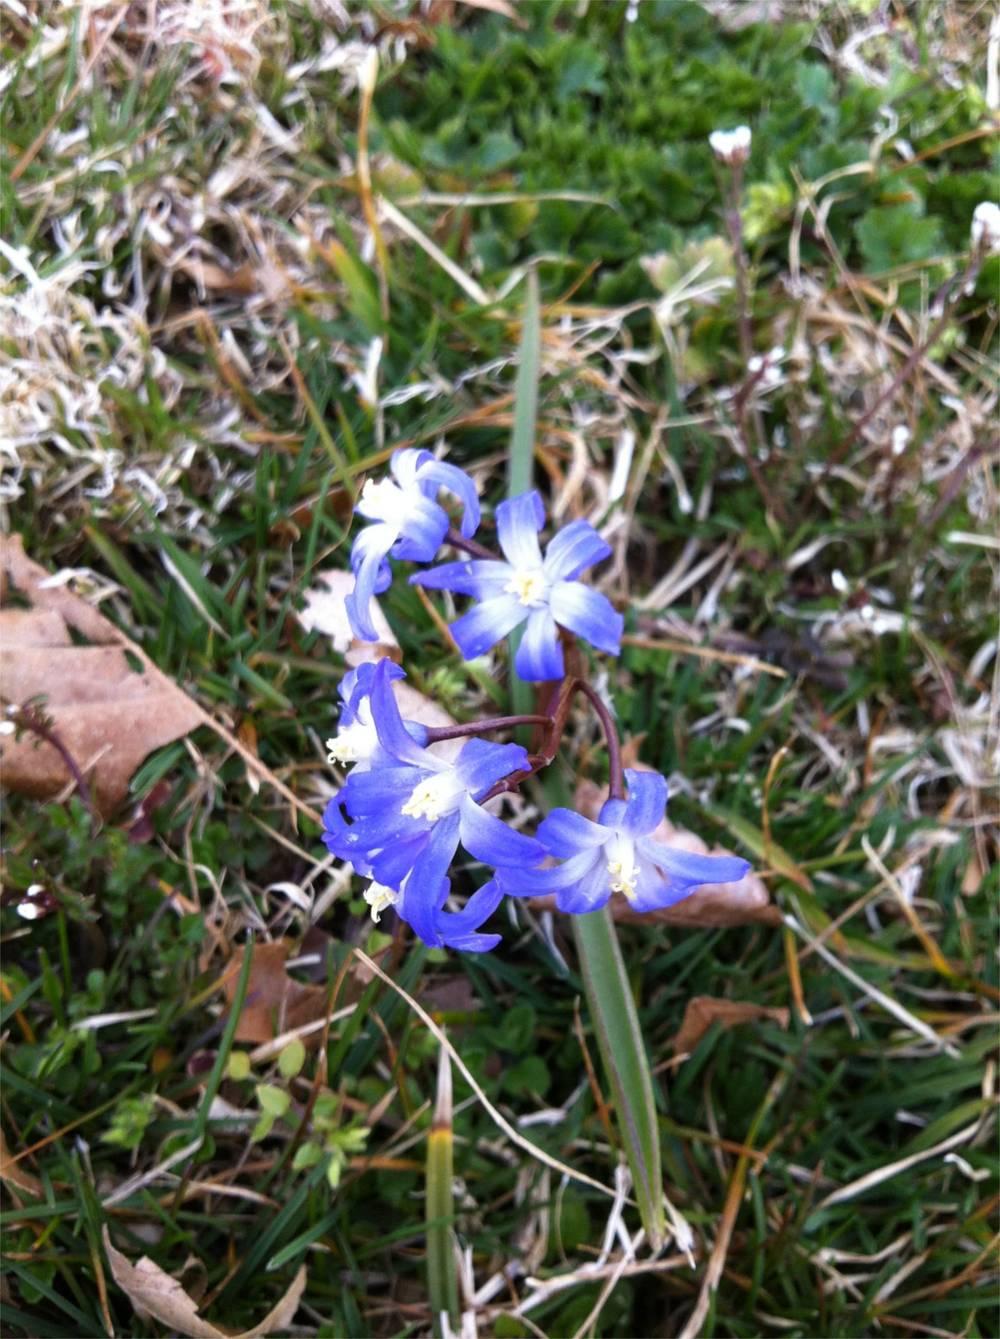 GLORY-OF-THE-SNOW  ( Chionodoxa luciliae  Boiss.), 3 April 2013, Stroud Preserve, Chester County, Pennsylvannia.